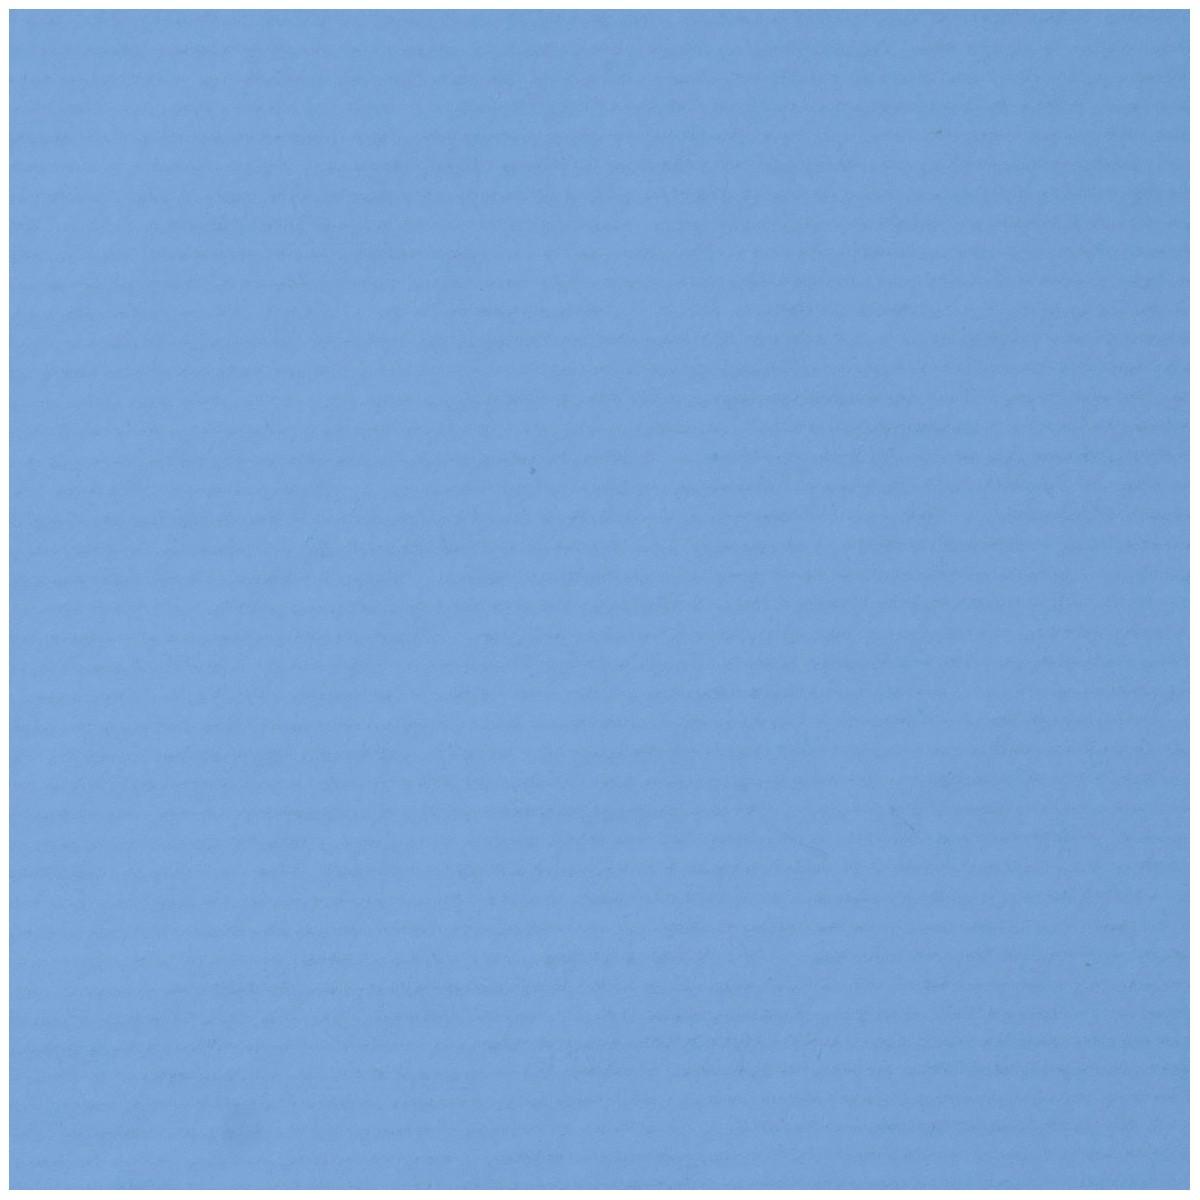 Carta Sealing Avana ECOBROWN Gr.60 Fogli Cm.70x100 Colori Tinta Unita (al Kg.) Azzurro